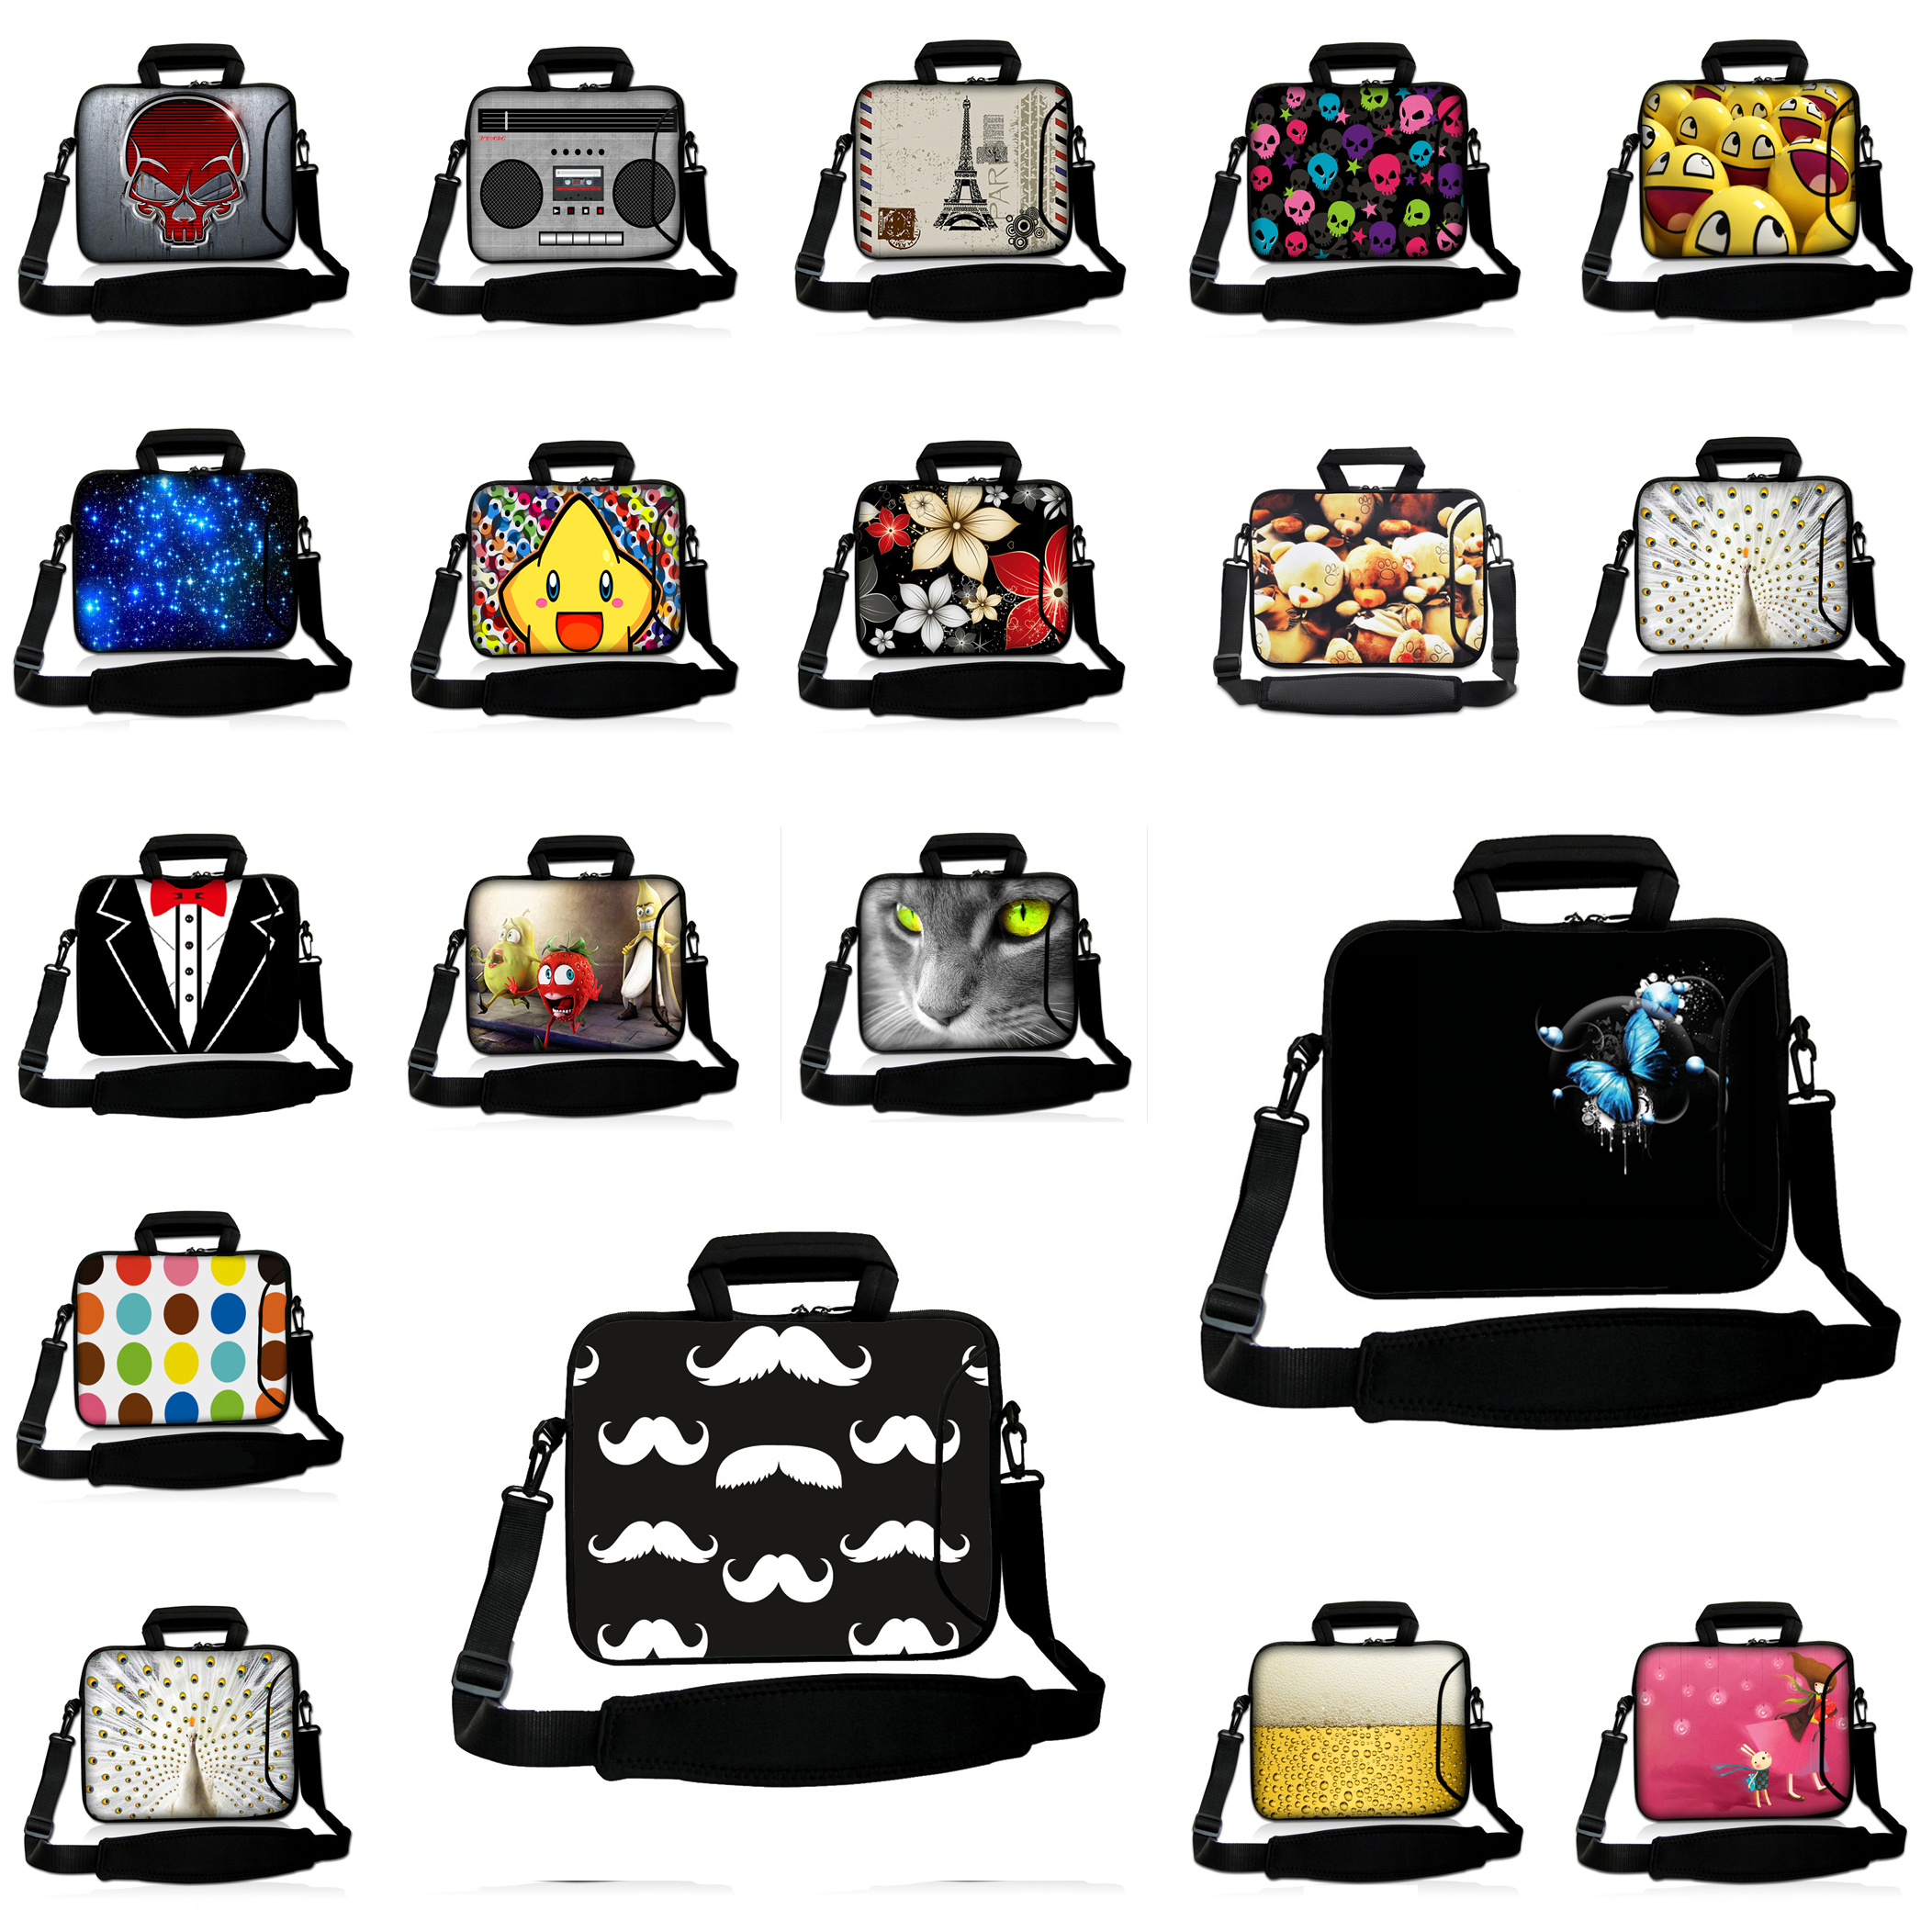 Hot Laptop Bag 15 6 Inch For Women And Men Neoprene Computer Briefcase Zipper Universal 15